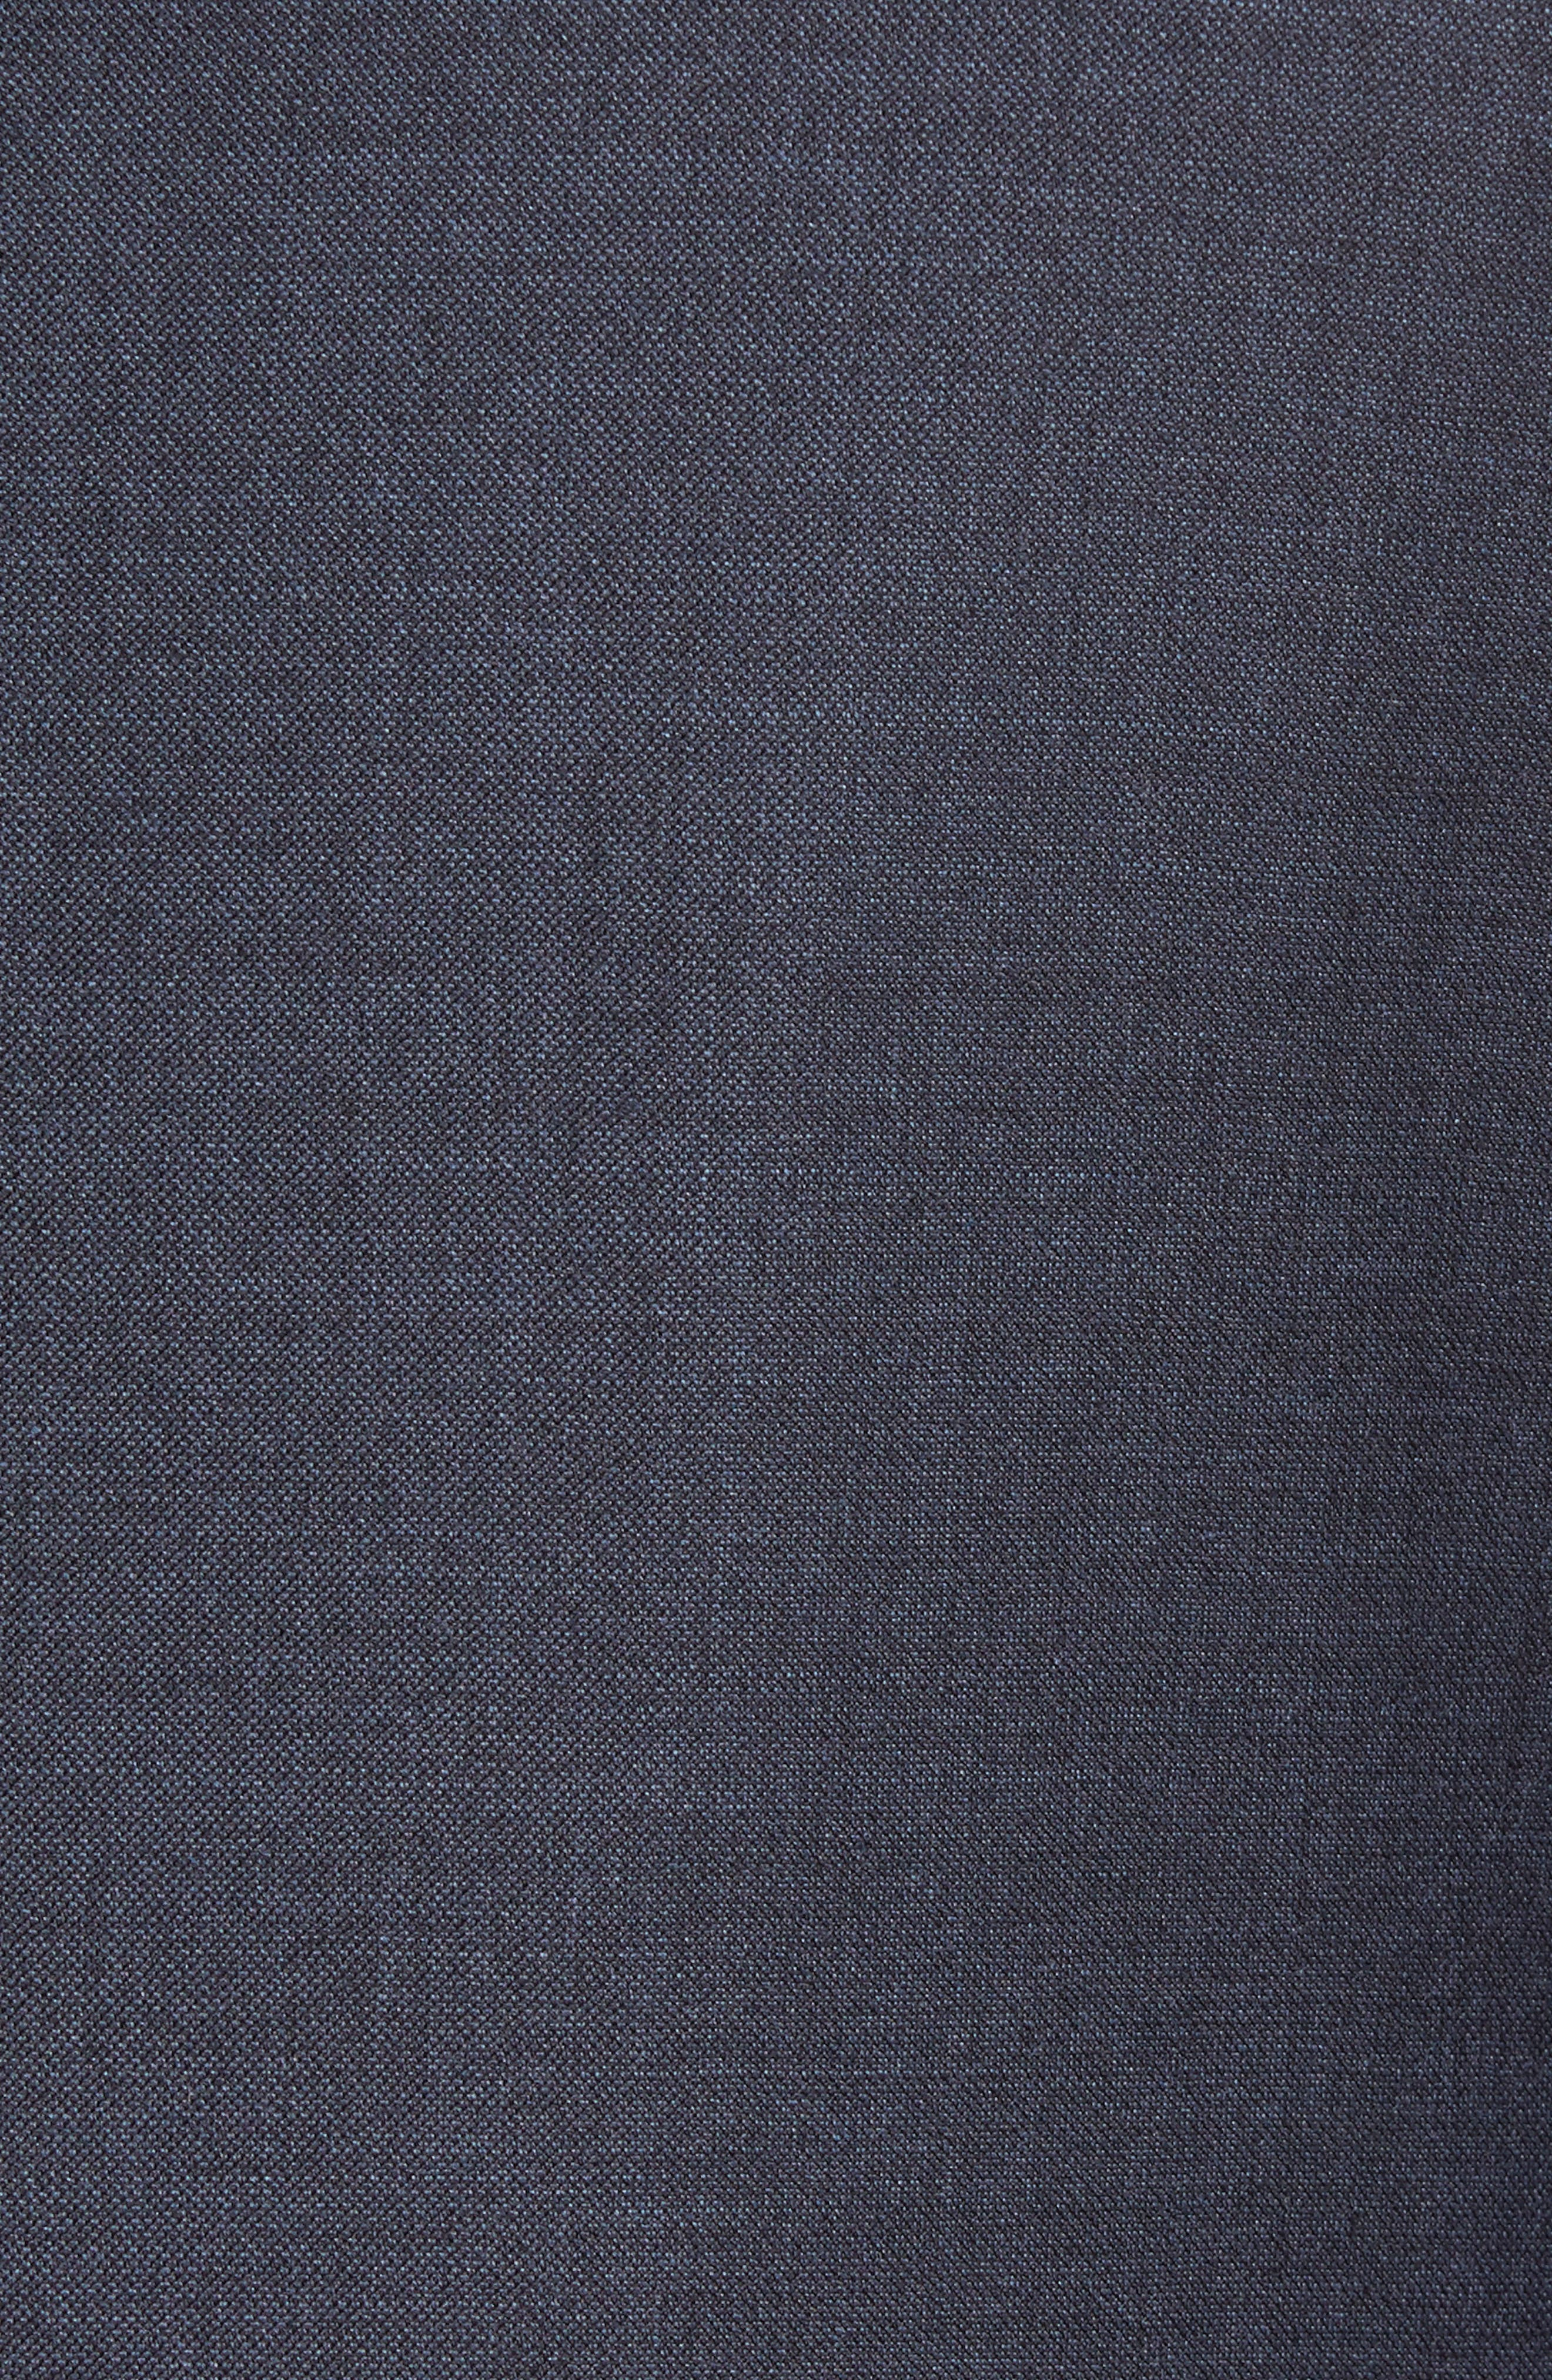 Ludlow Trim Fit Solid Wool Sport Coat,                             Alternate thumbnail 10, color,